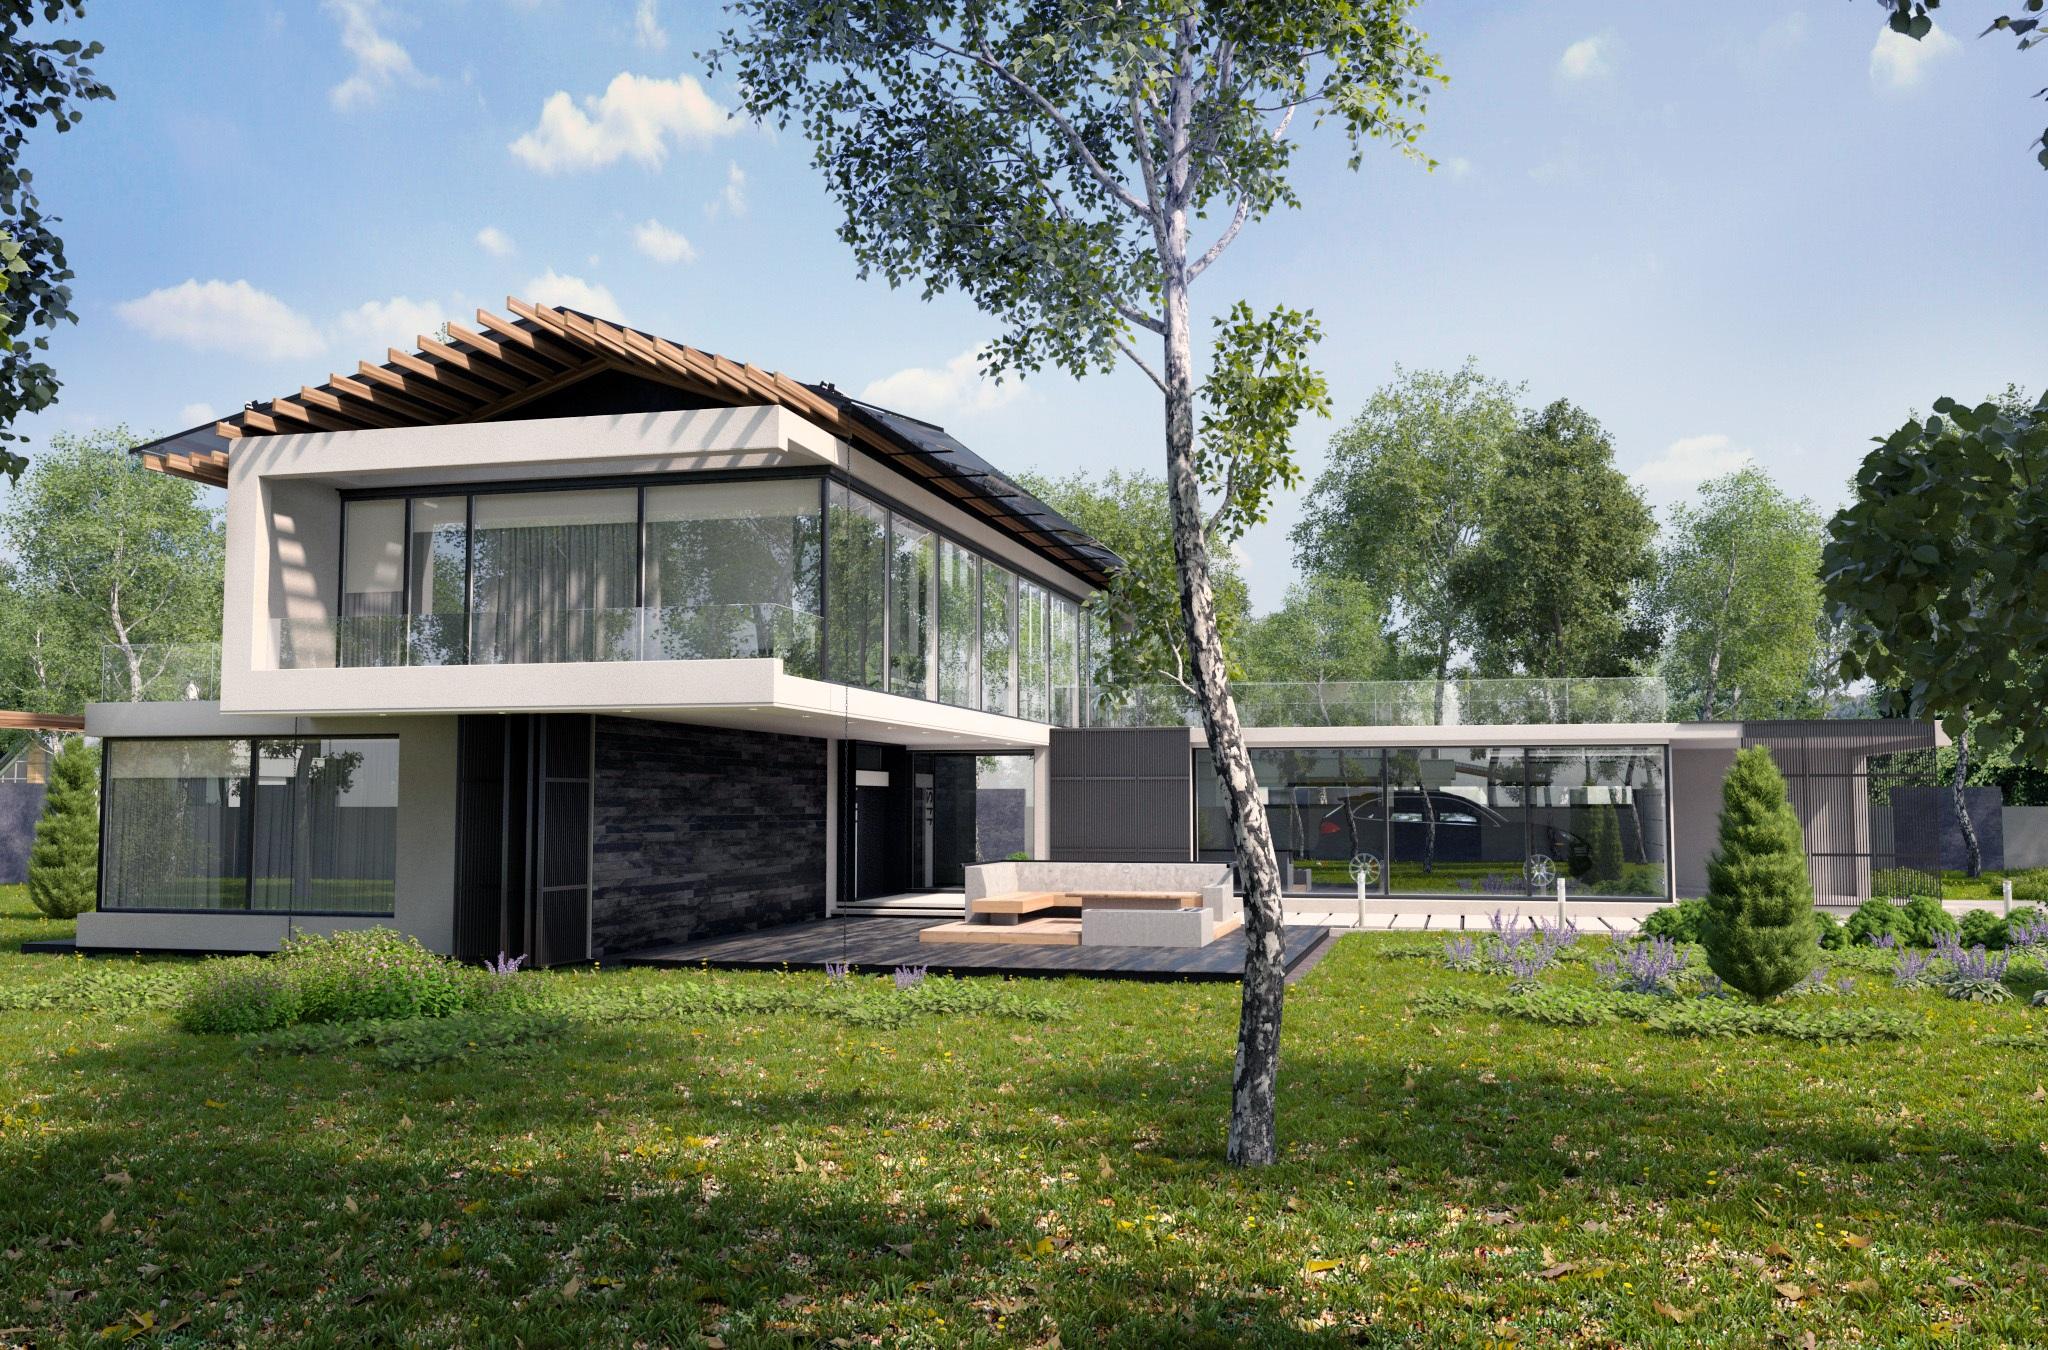 Banco de imagens rvore arquitetura villa casa for Piani di casa cottage gotico